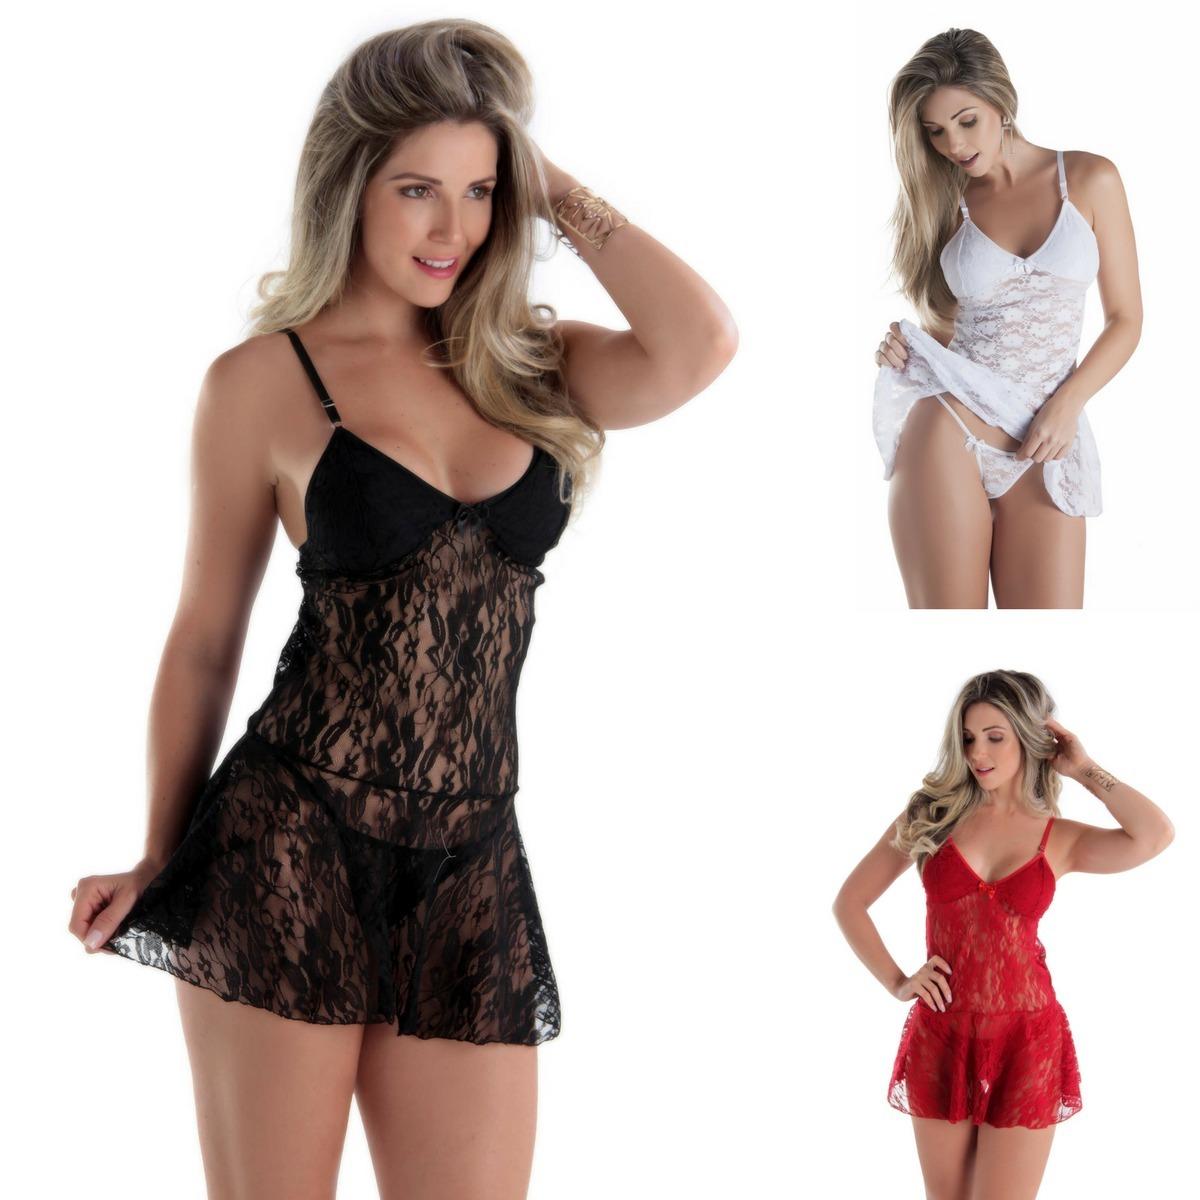 ee38807ffa17fa Camisola Sexy Sexi Pijama Sensual Roupa De Dormir Feminina